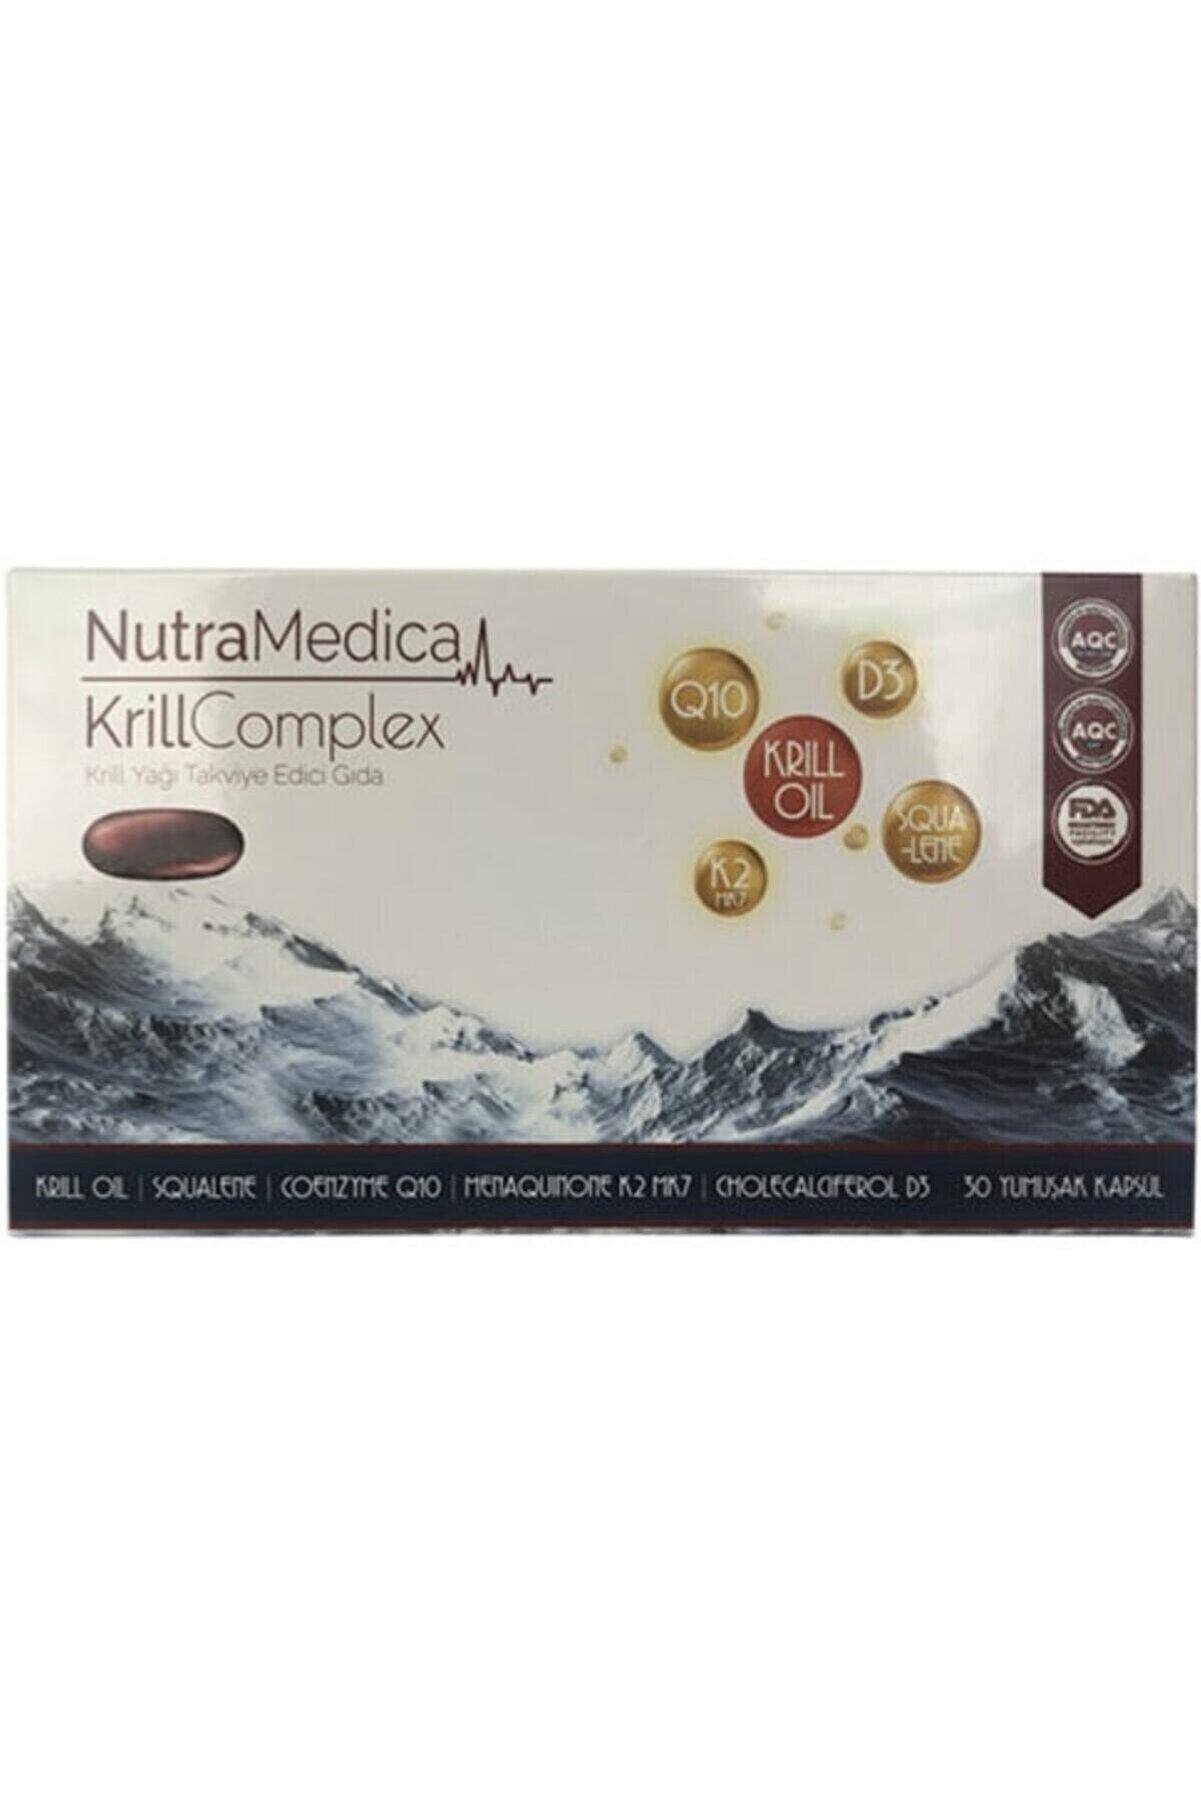 Nutra Medica Krill Complex